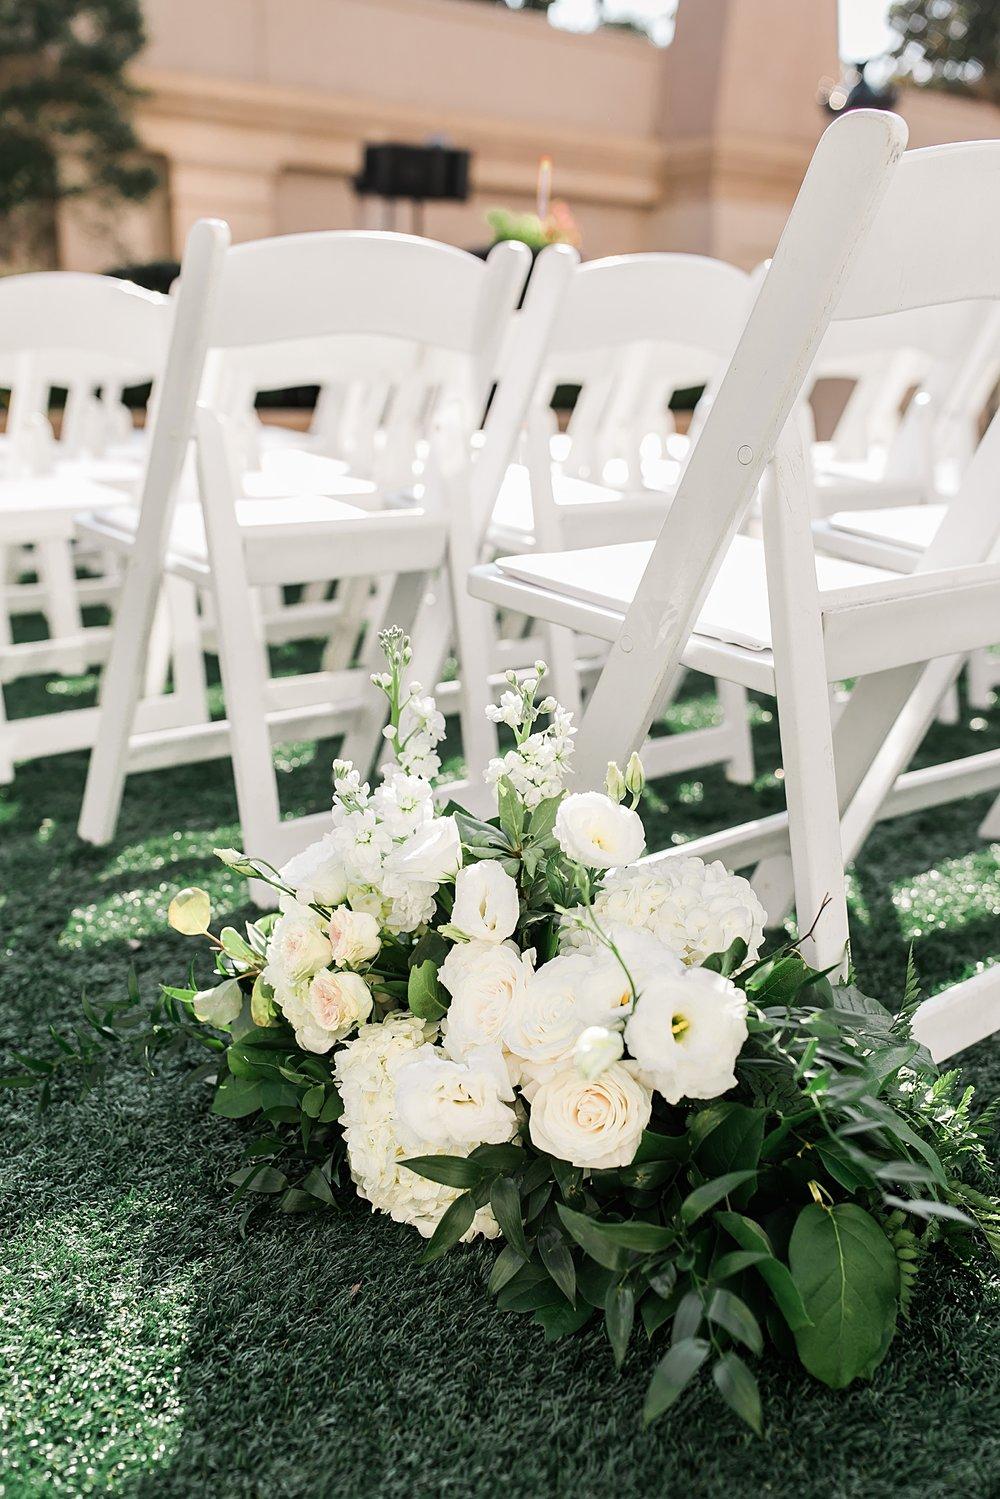 st-regis-wedding-photographer-atlanta-jb-marie-photography